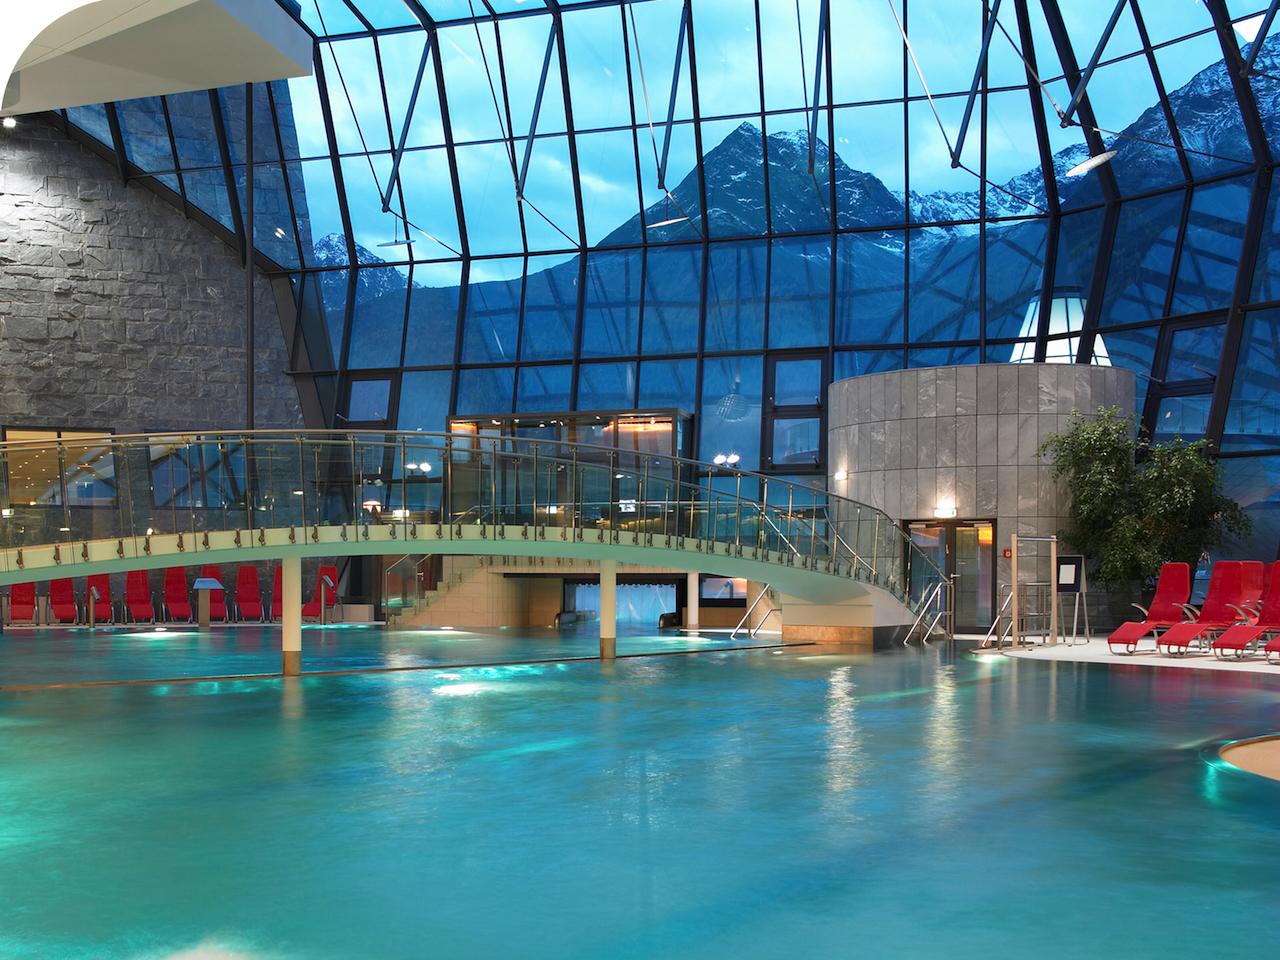 Aqua Dome Tirol. Indoor Thermal pool 2